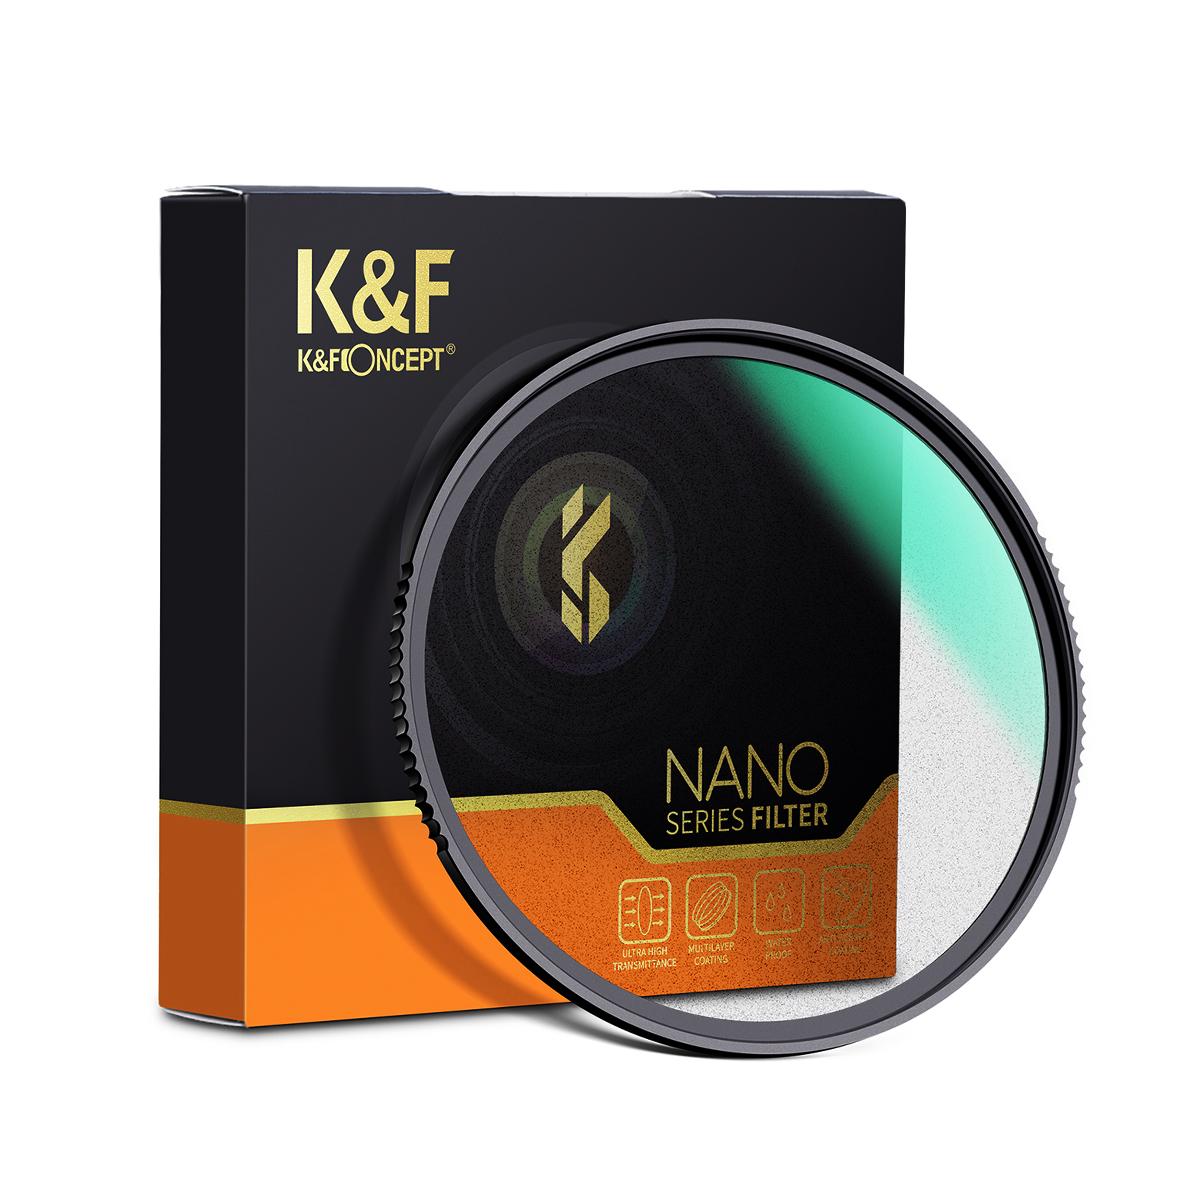 K&F Concept NANO-X ブラックディフュージョン 1/1 フィルター KF- (49-82) BD1/1 (ブラックミスト)